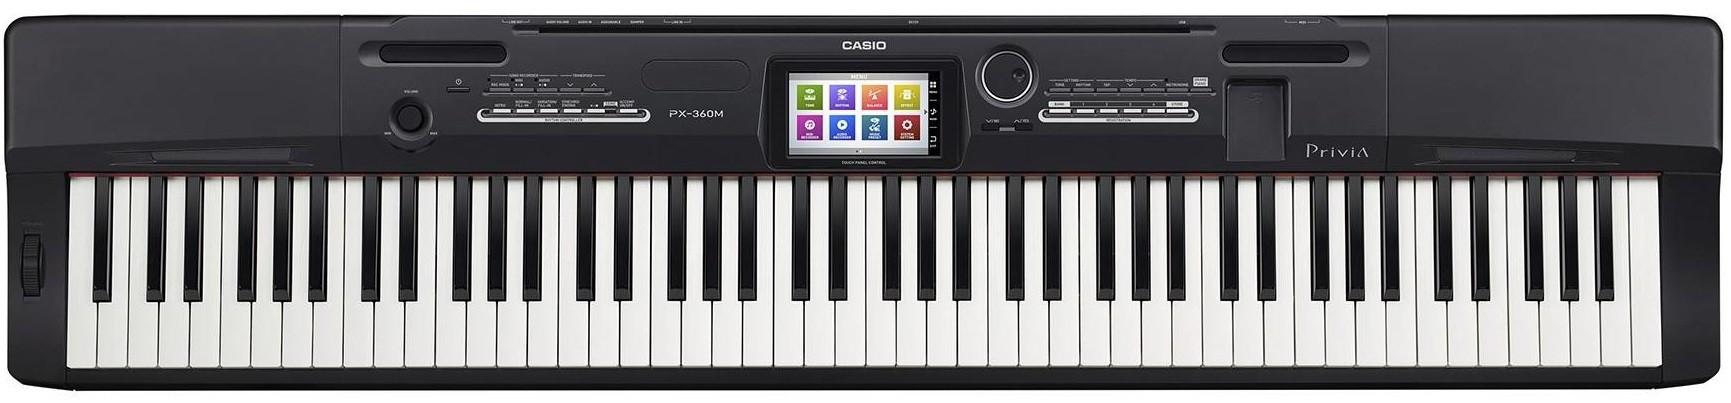 Пианино Casio Privia PX-360MBK